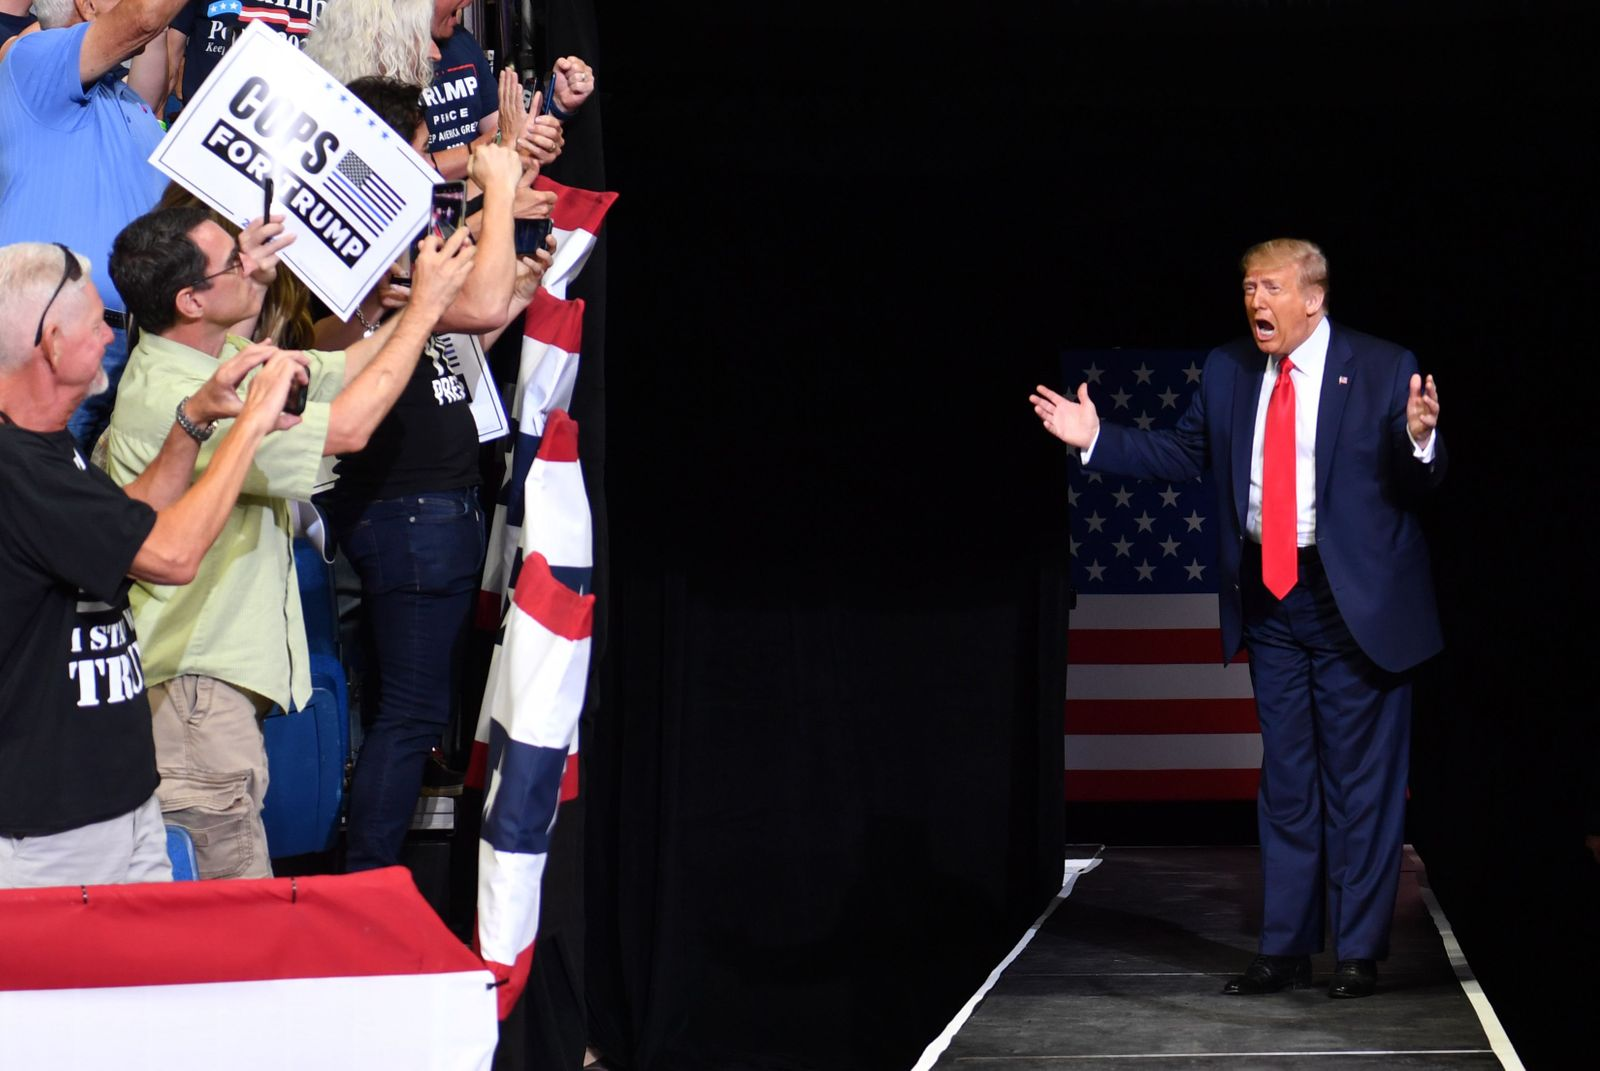 FILES-US-POLITICS-VOTE-RALLY-TRUMP